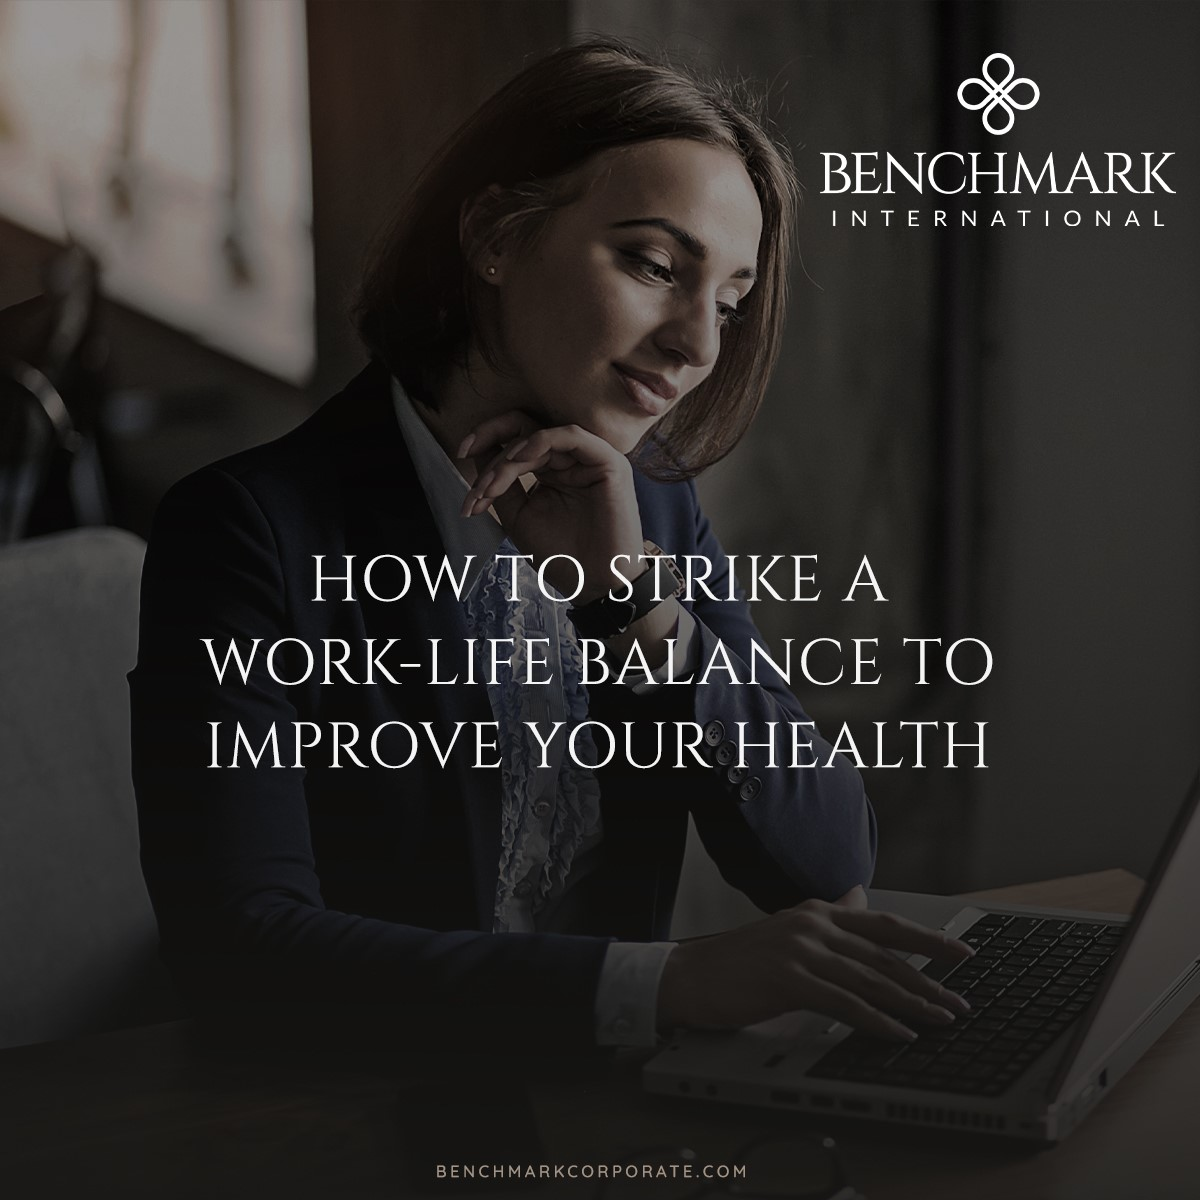 Striking a Work-Life Balance